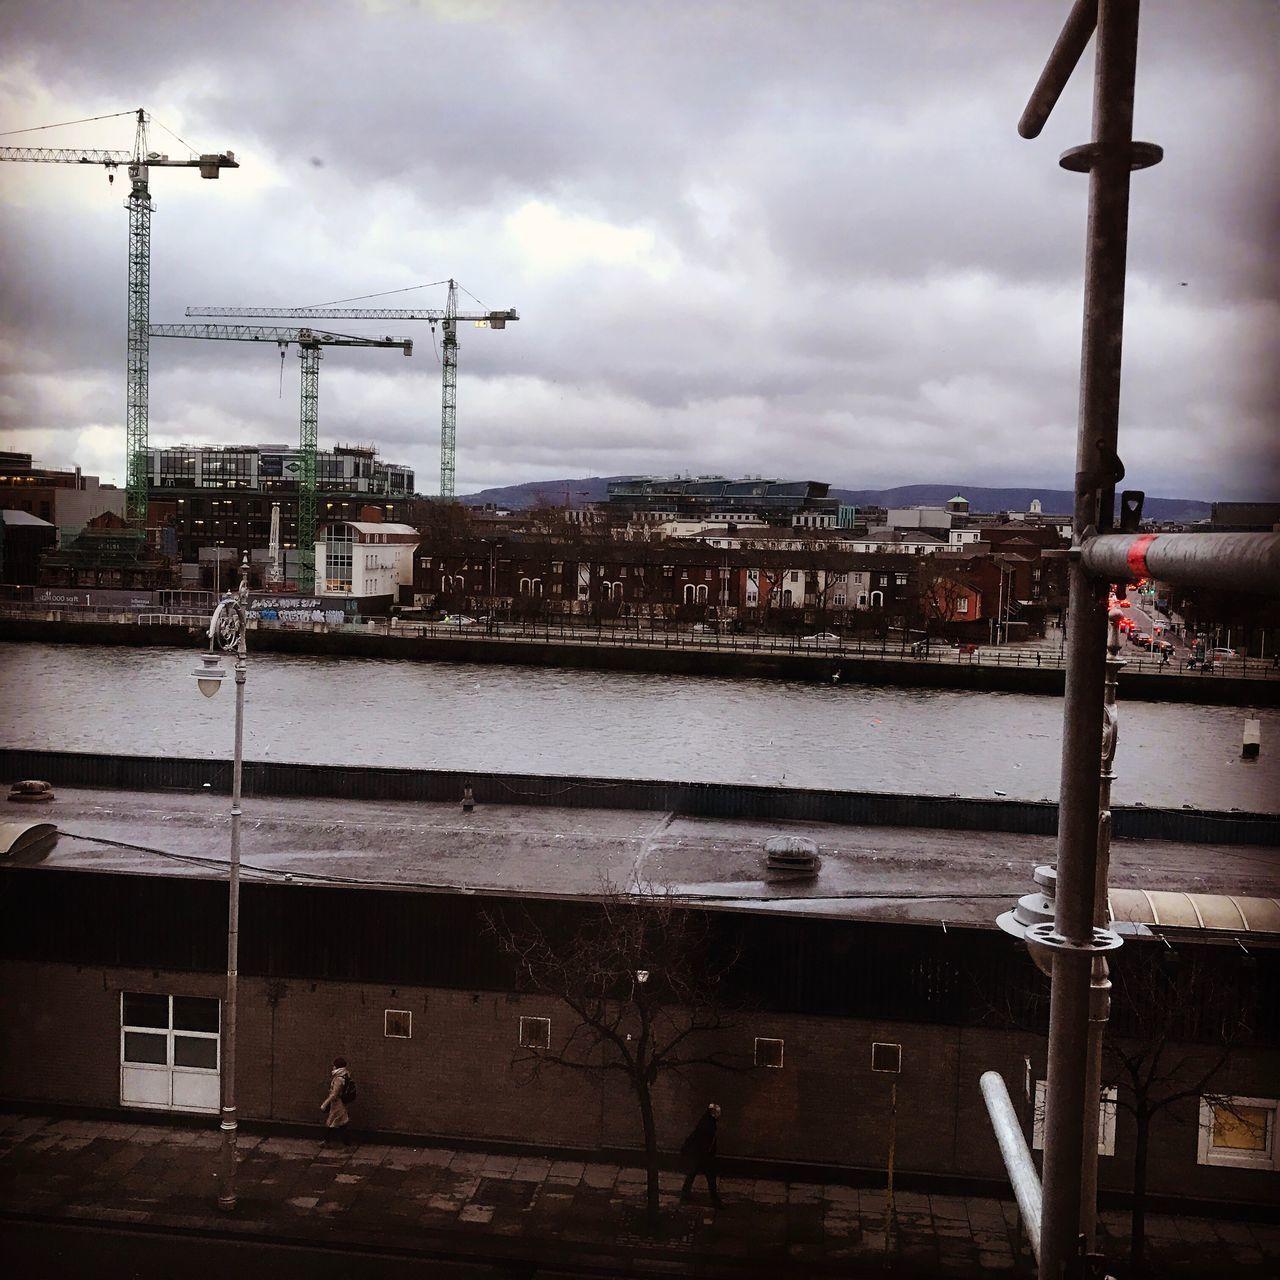 Sky Building Exterior Cloud - Sky City Water Outdoors Day Ontheroad Morningview Urban Skyline Dublin, Ireland